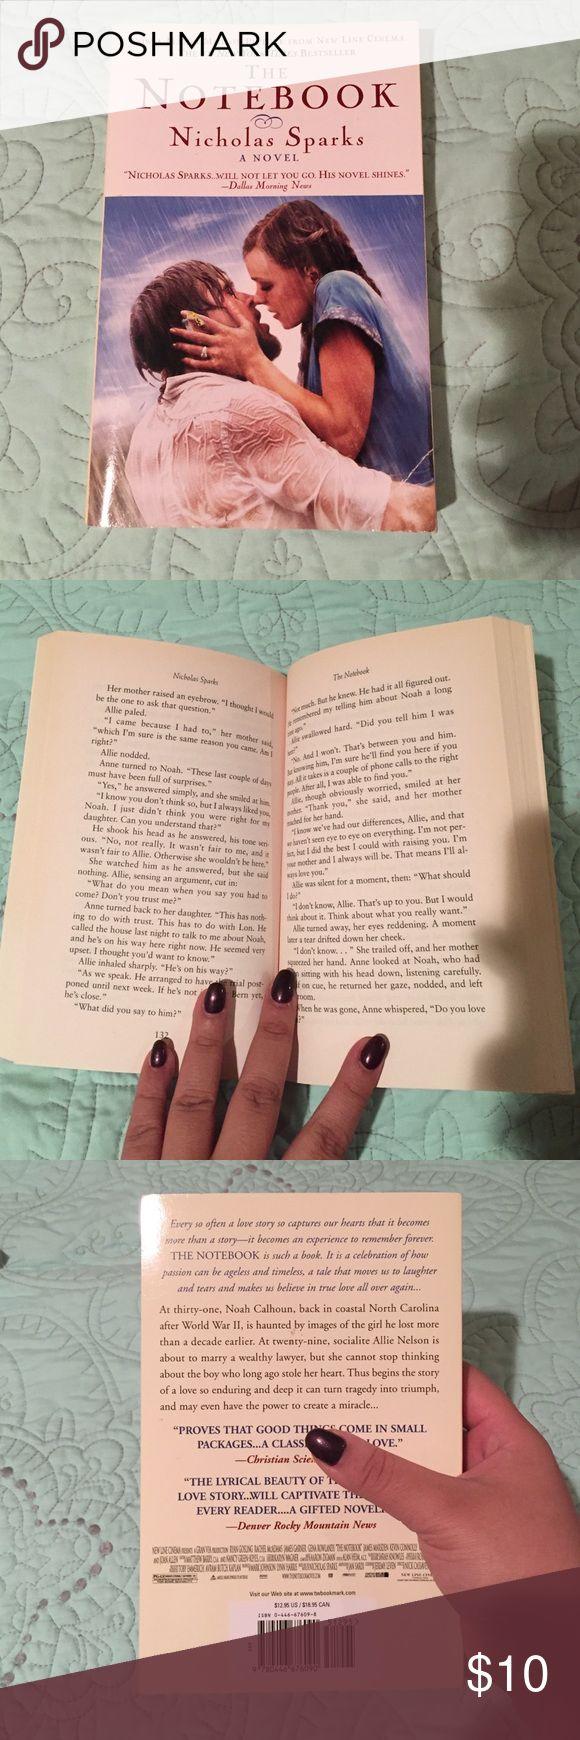 The Notebook Novel